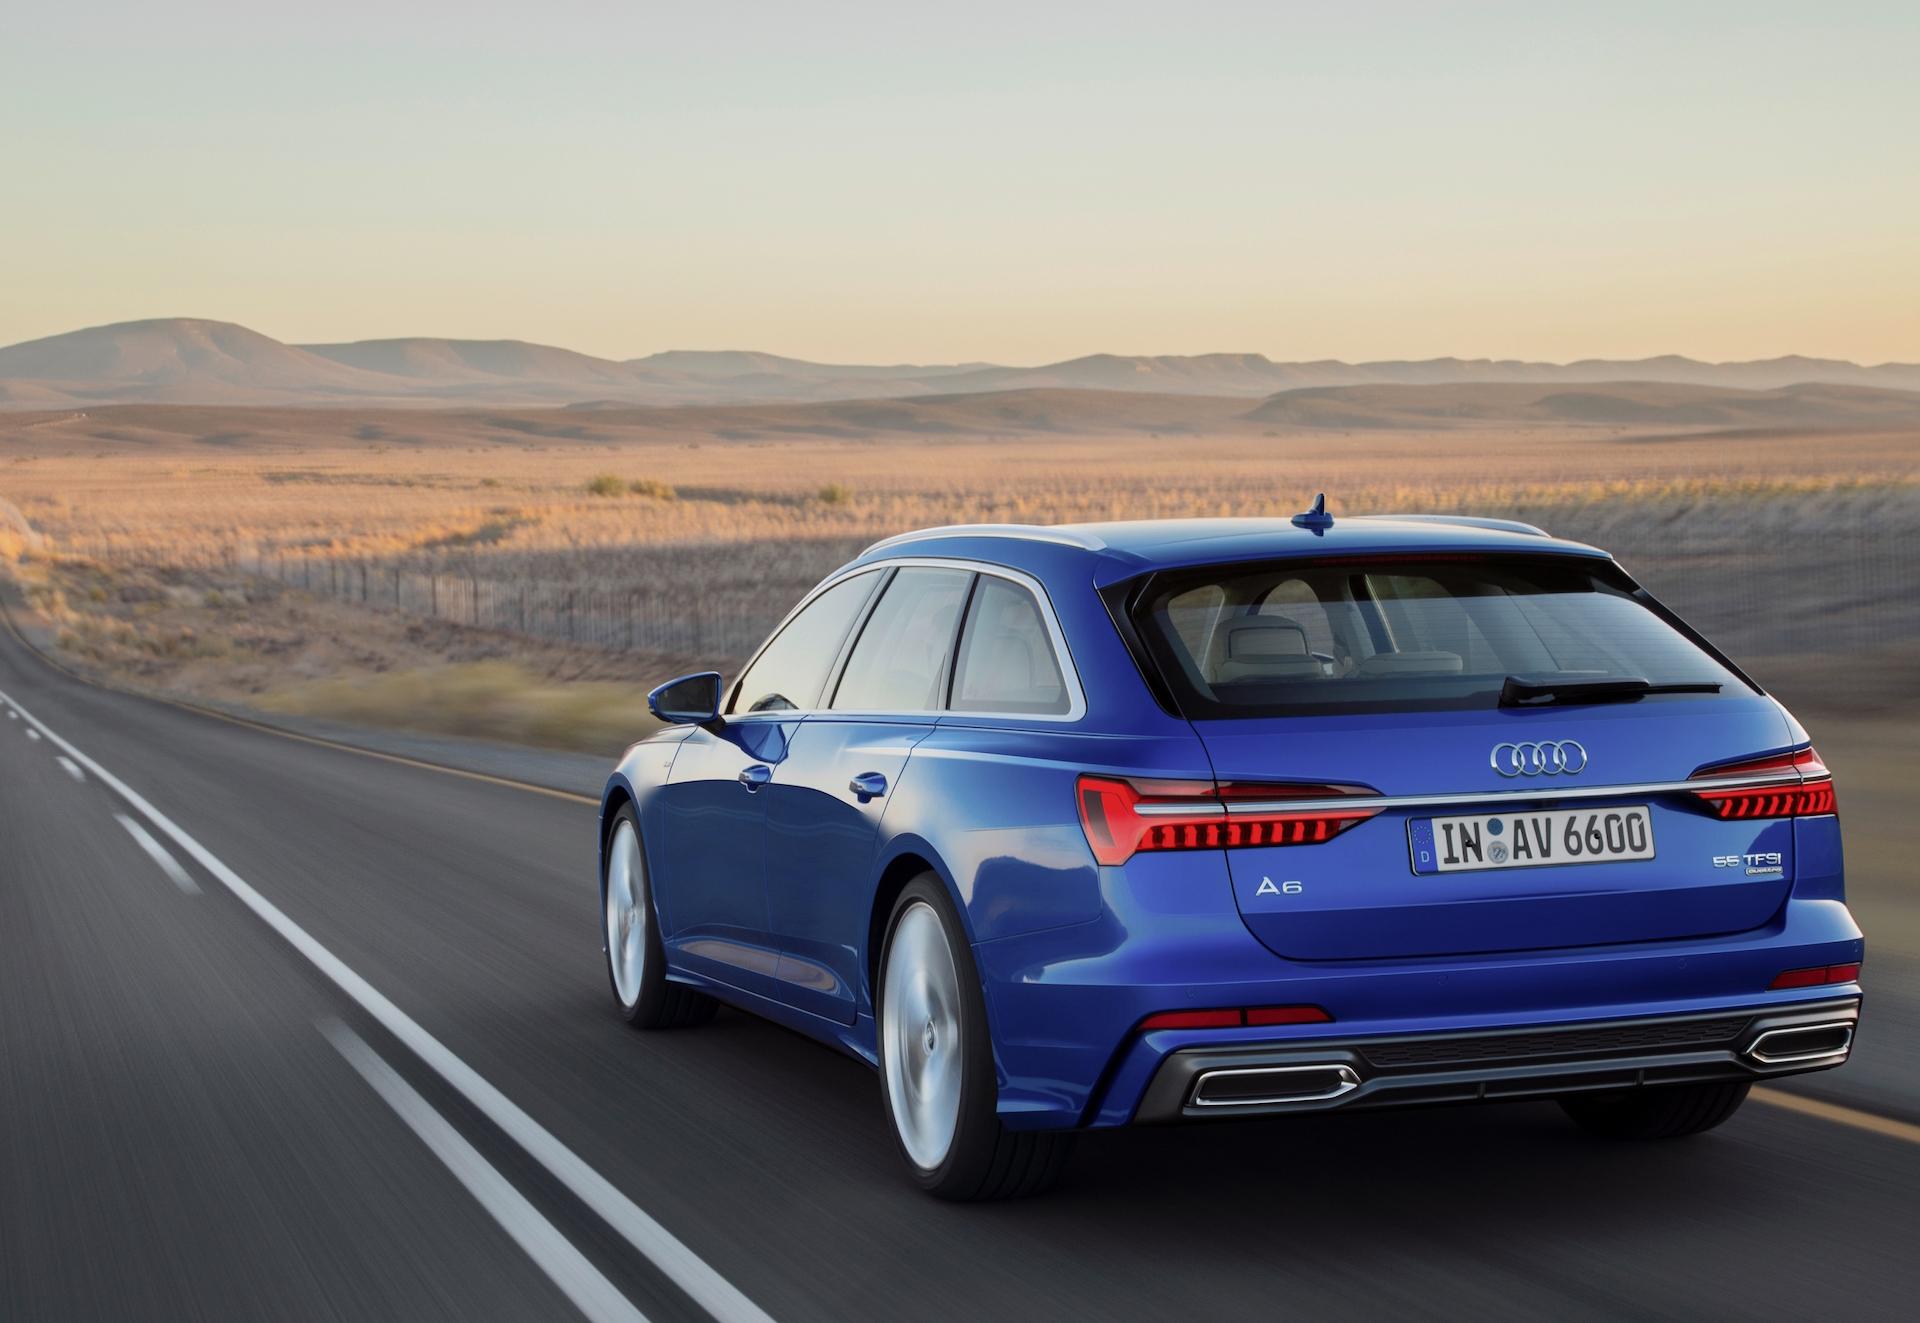 nuova audi a6 avant blu posteriore panorama